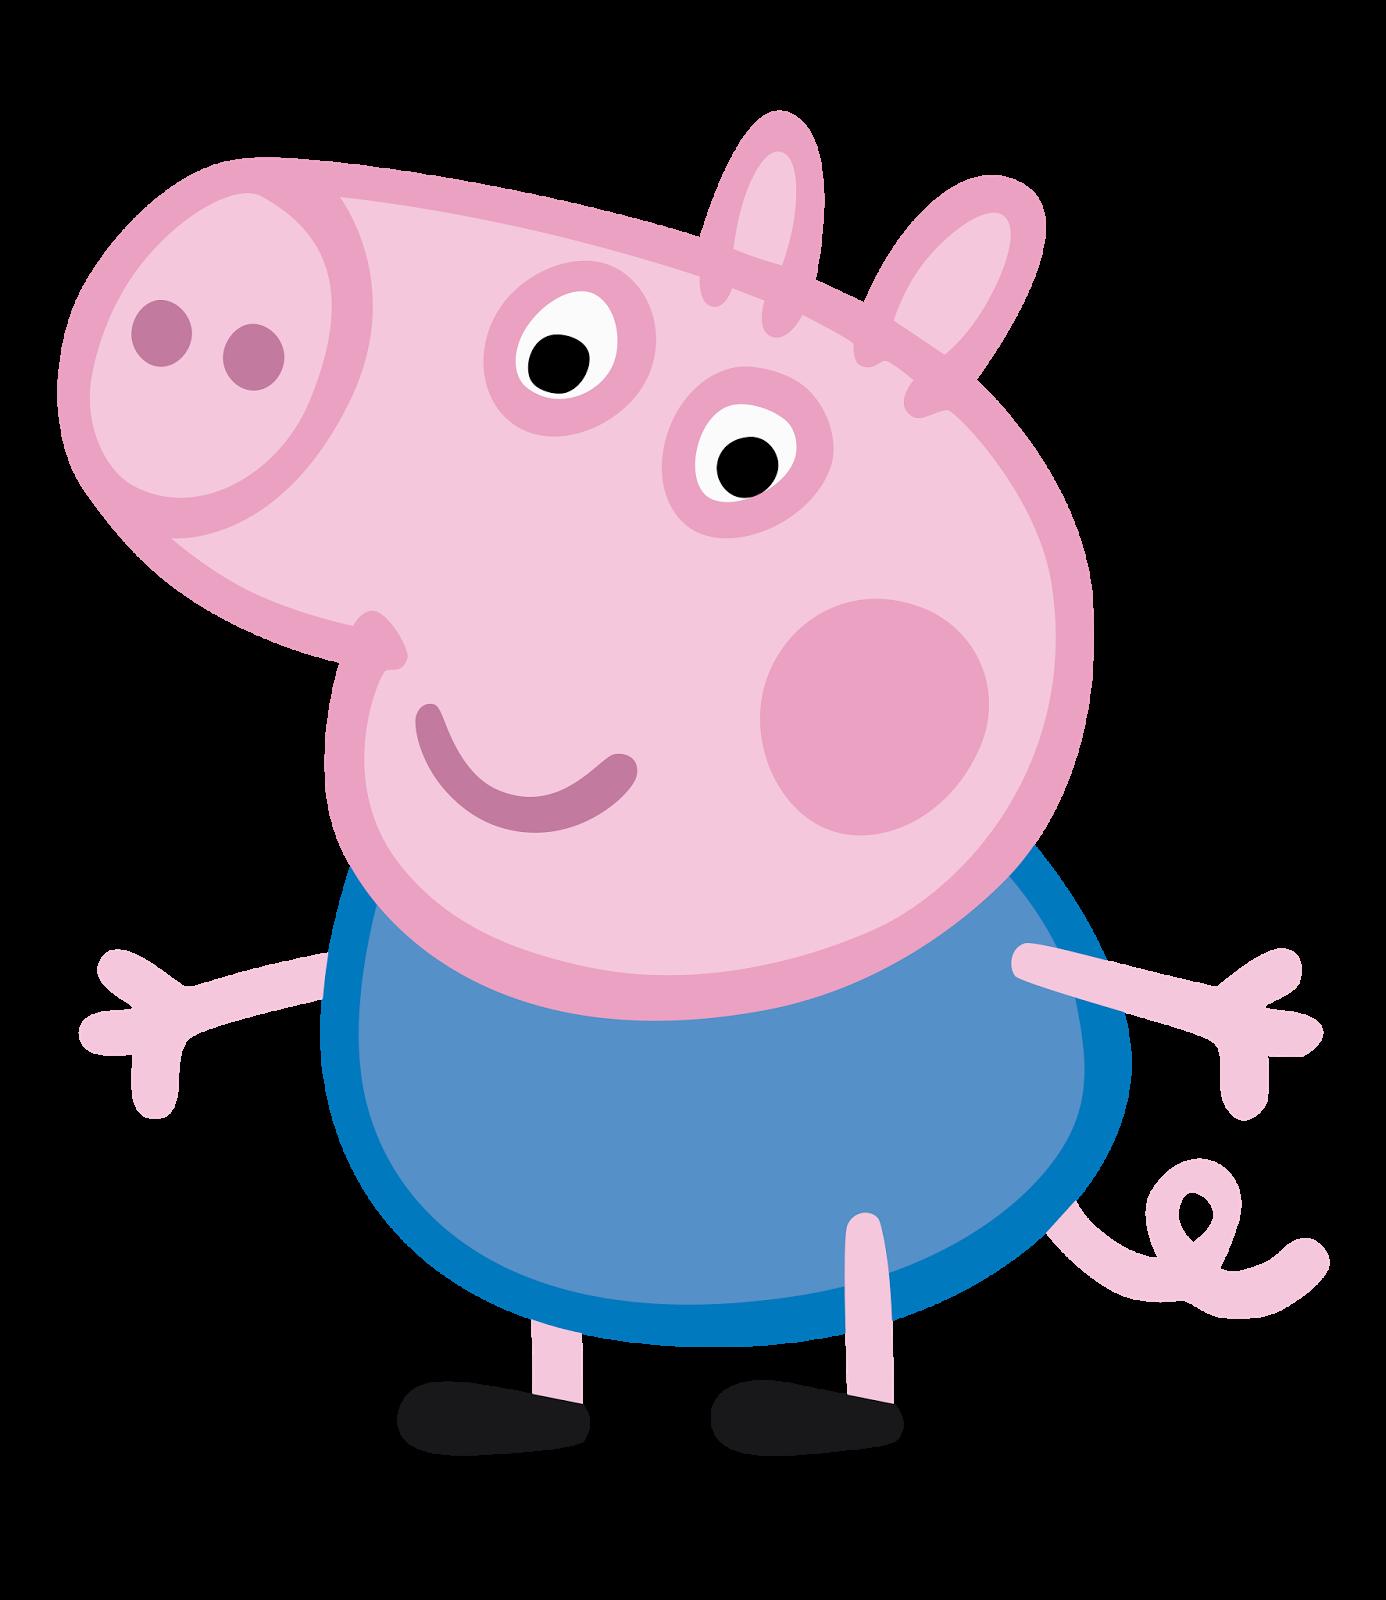 PNG Peppa Pig Transparent Peppa Pig.PNG Images..